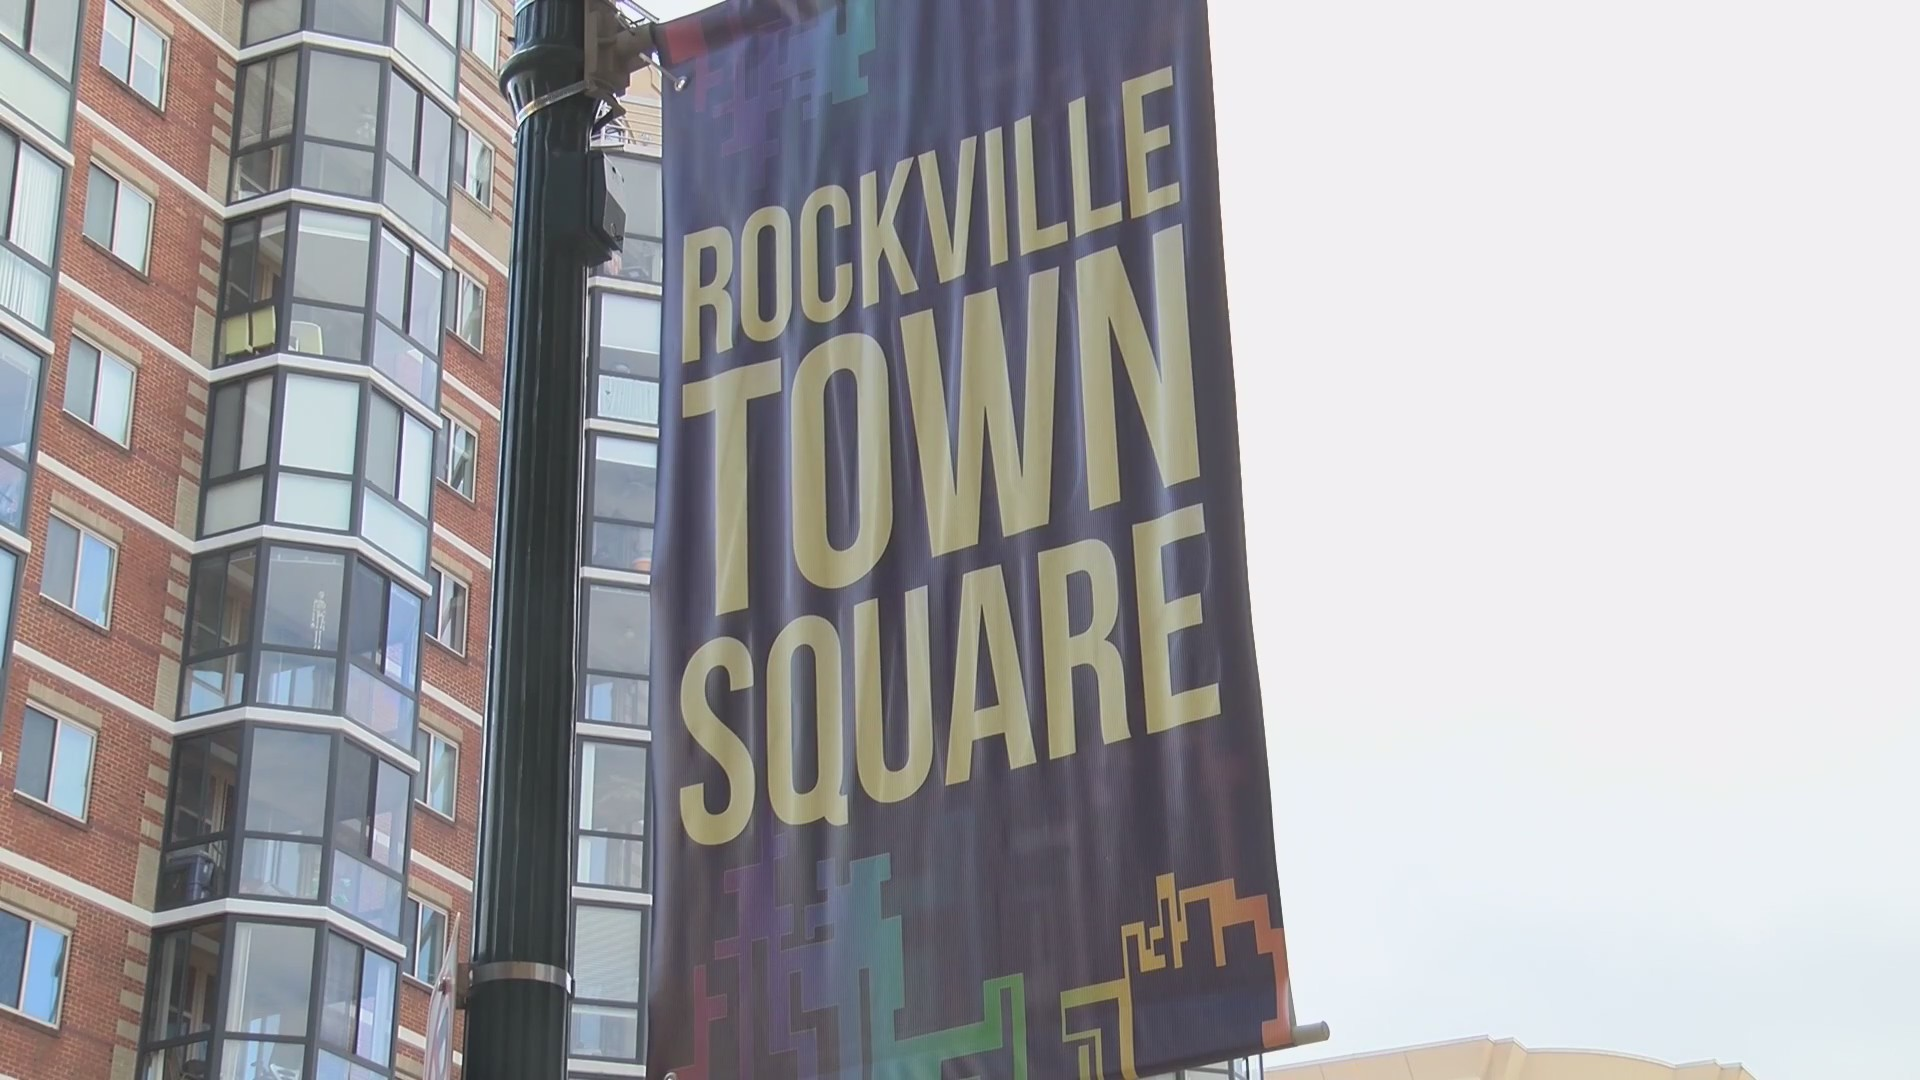 Rockville_revitalization_0_20181120235108